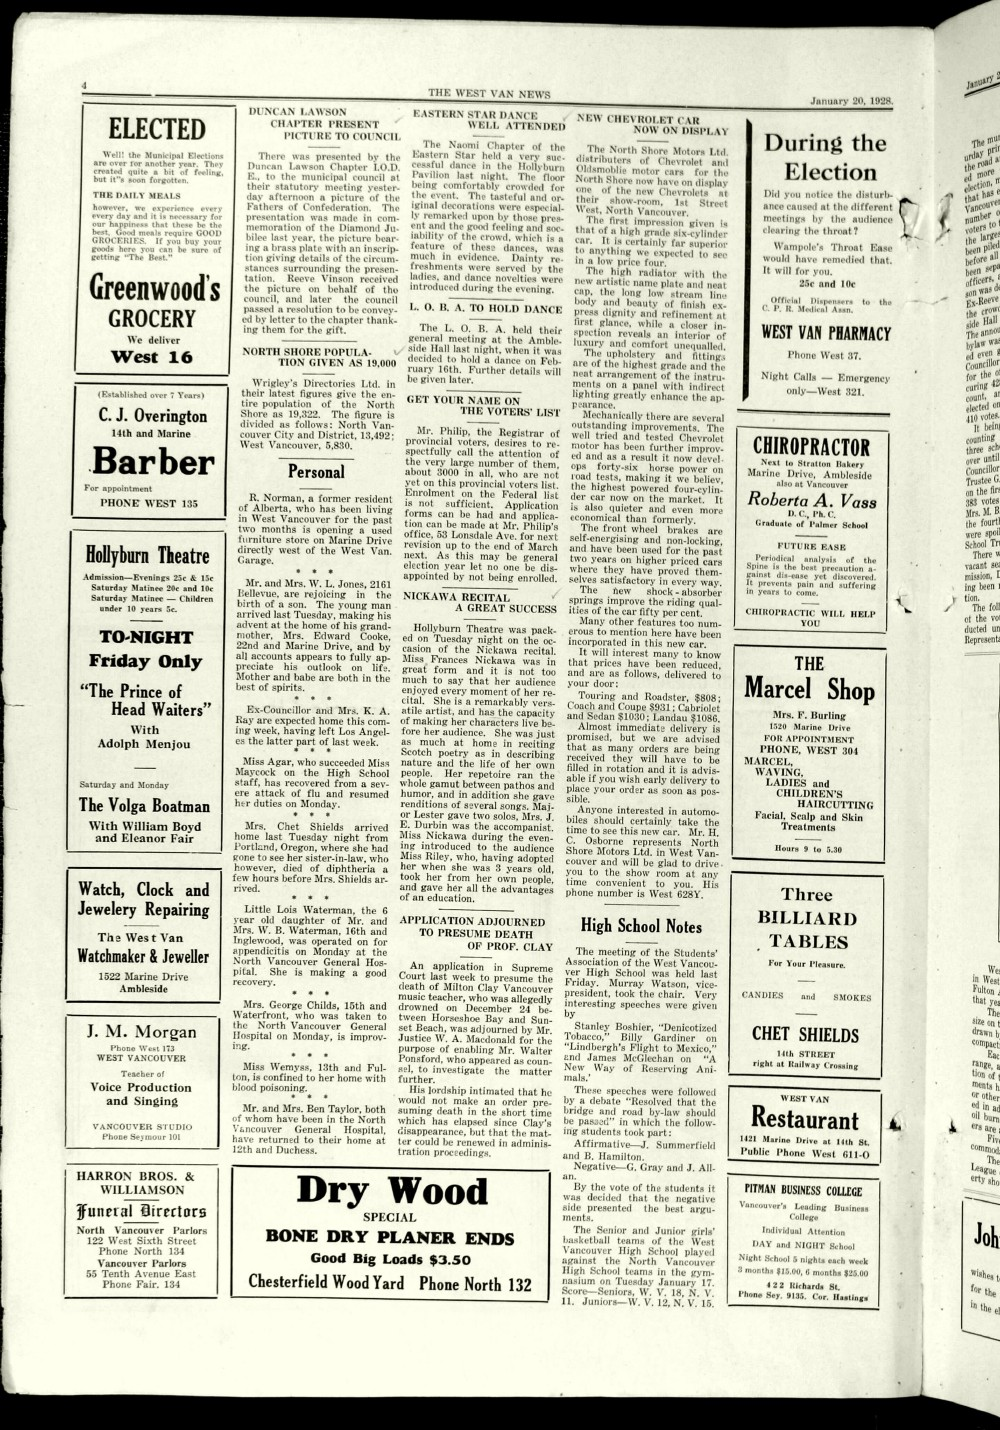 West Van. News (West Vancouver), 20 Jan 1928